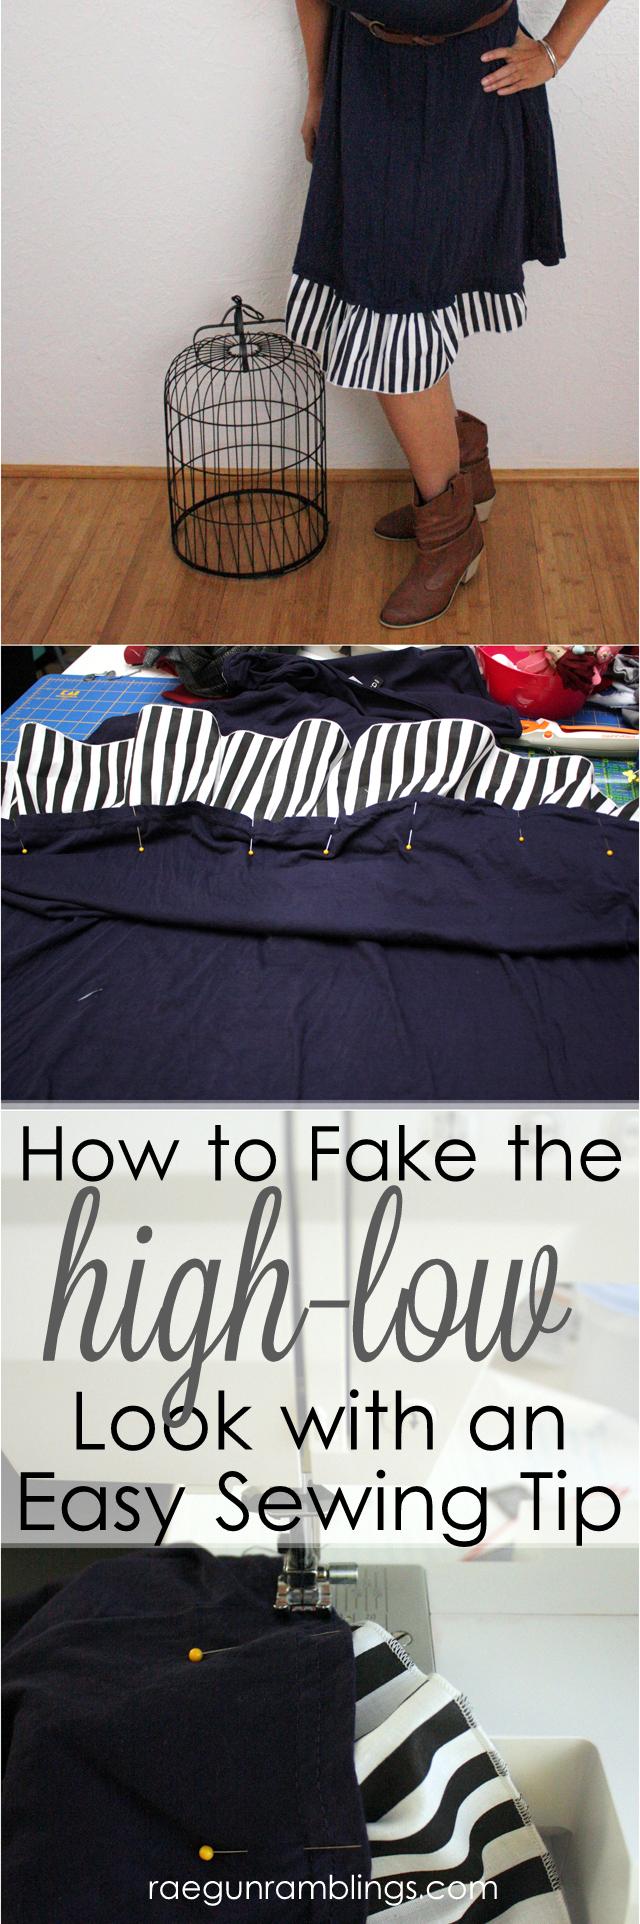 High-low fake out dress tutorial - Rae Gun Ramblings